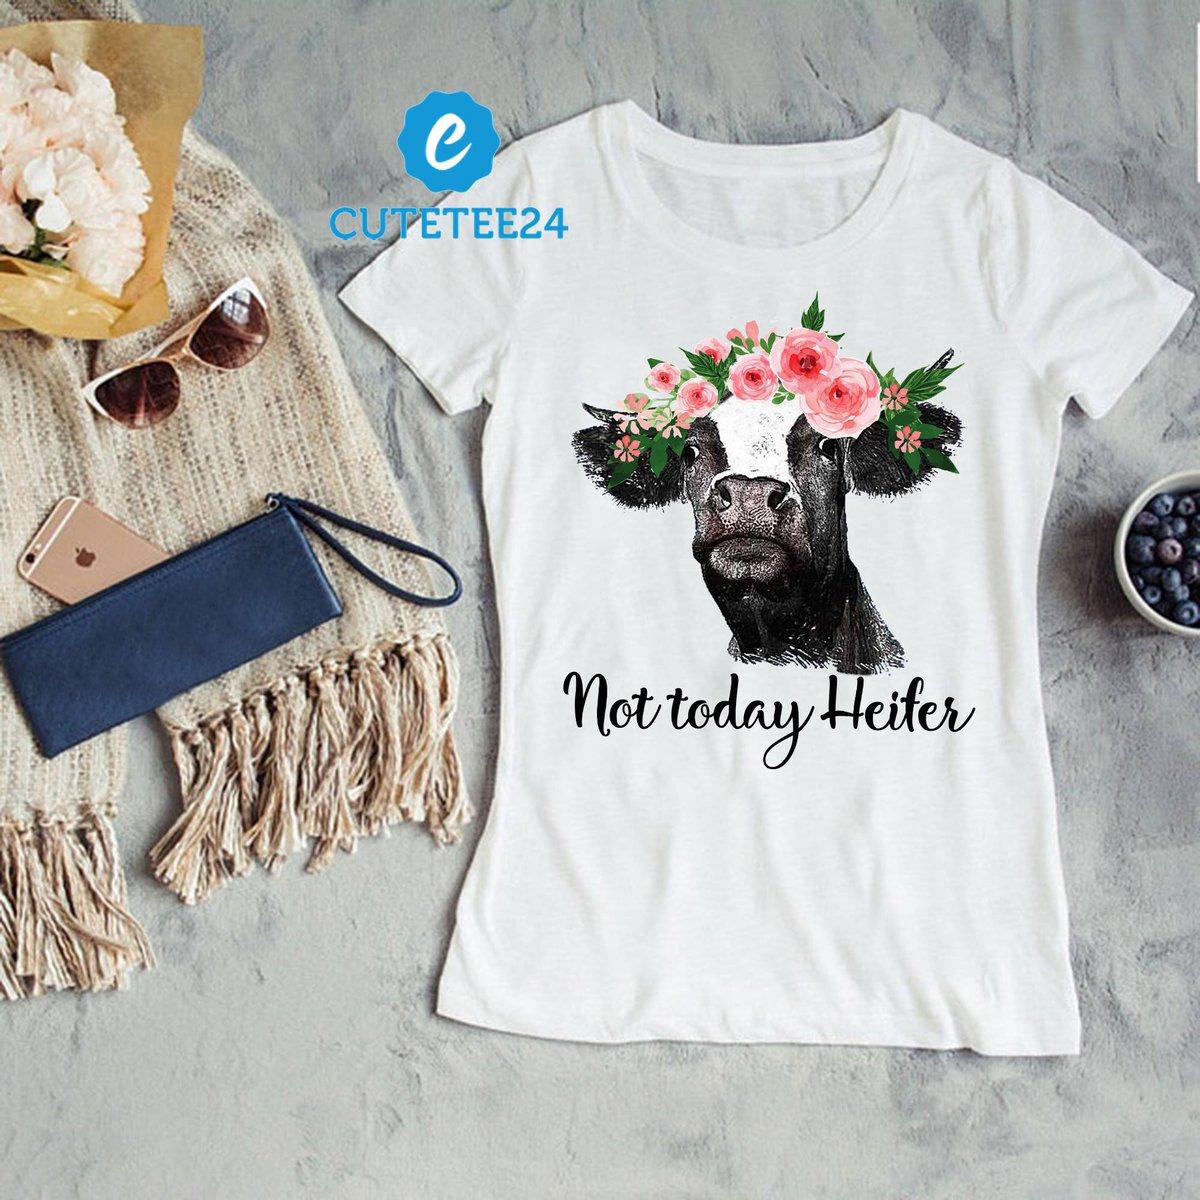 516377549 ... Not Today Heifer Short-Sleeve Unisex T-Shirt, Funny Heifer T-shirt, Cow  Funny Women T-shirt https://etsy.me/2AD2f82 #clothing #women #tshirt #heifer  ...